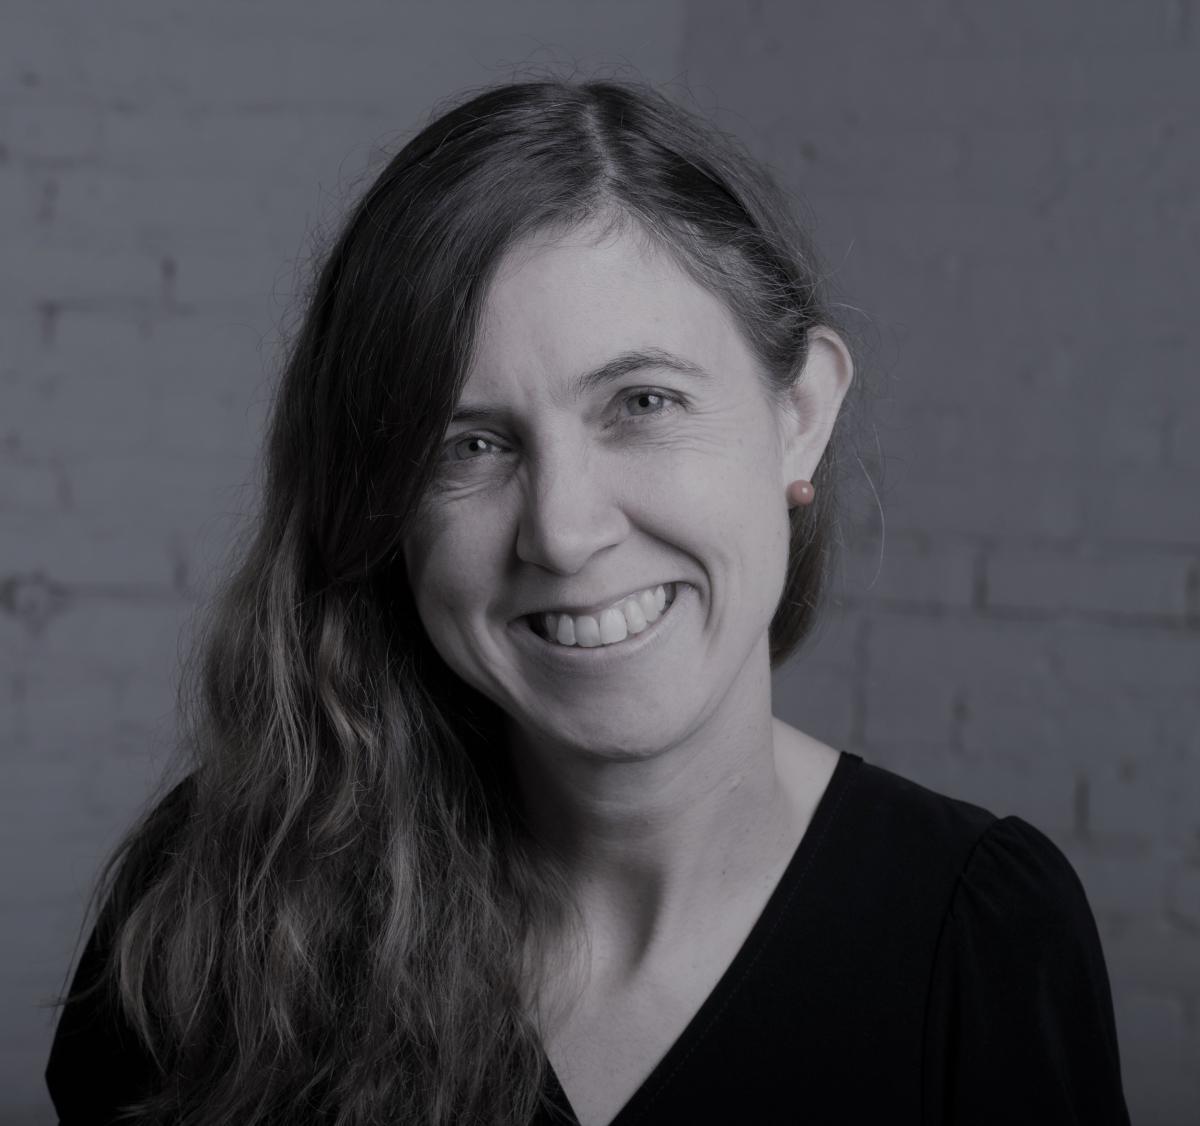 Susanna Gilbertson